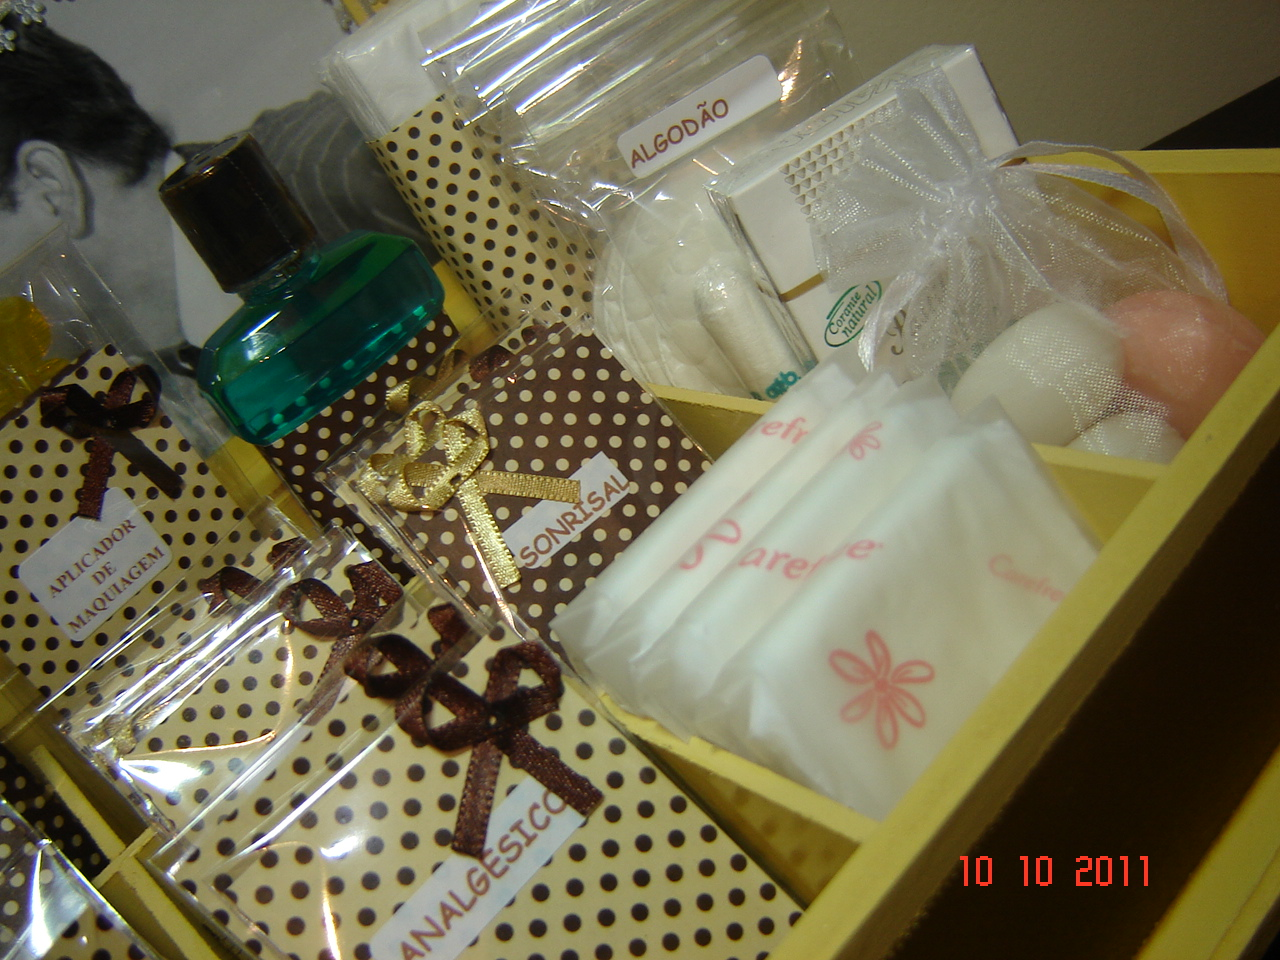 Kit Banheiro Amarelo Estilo Retrô Kit Toalete para Casamento #634B24 1280 960